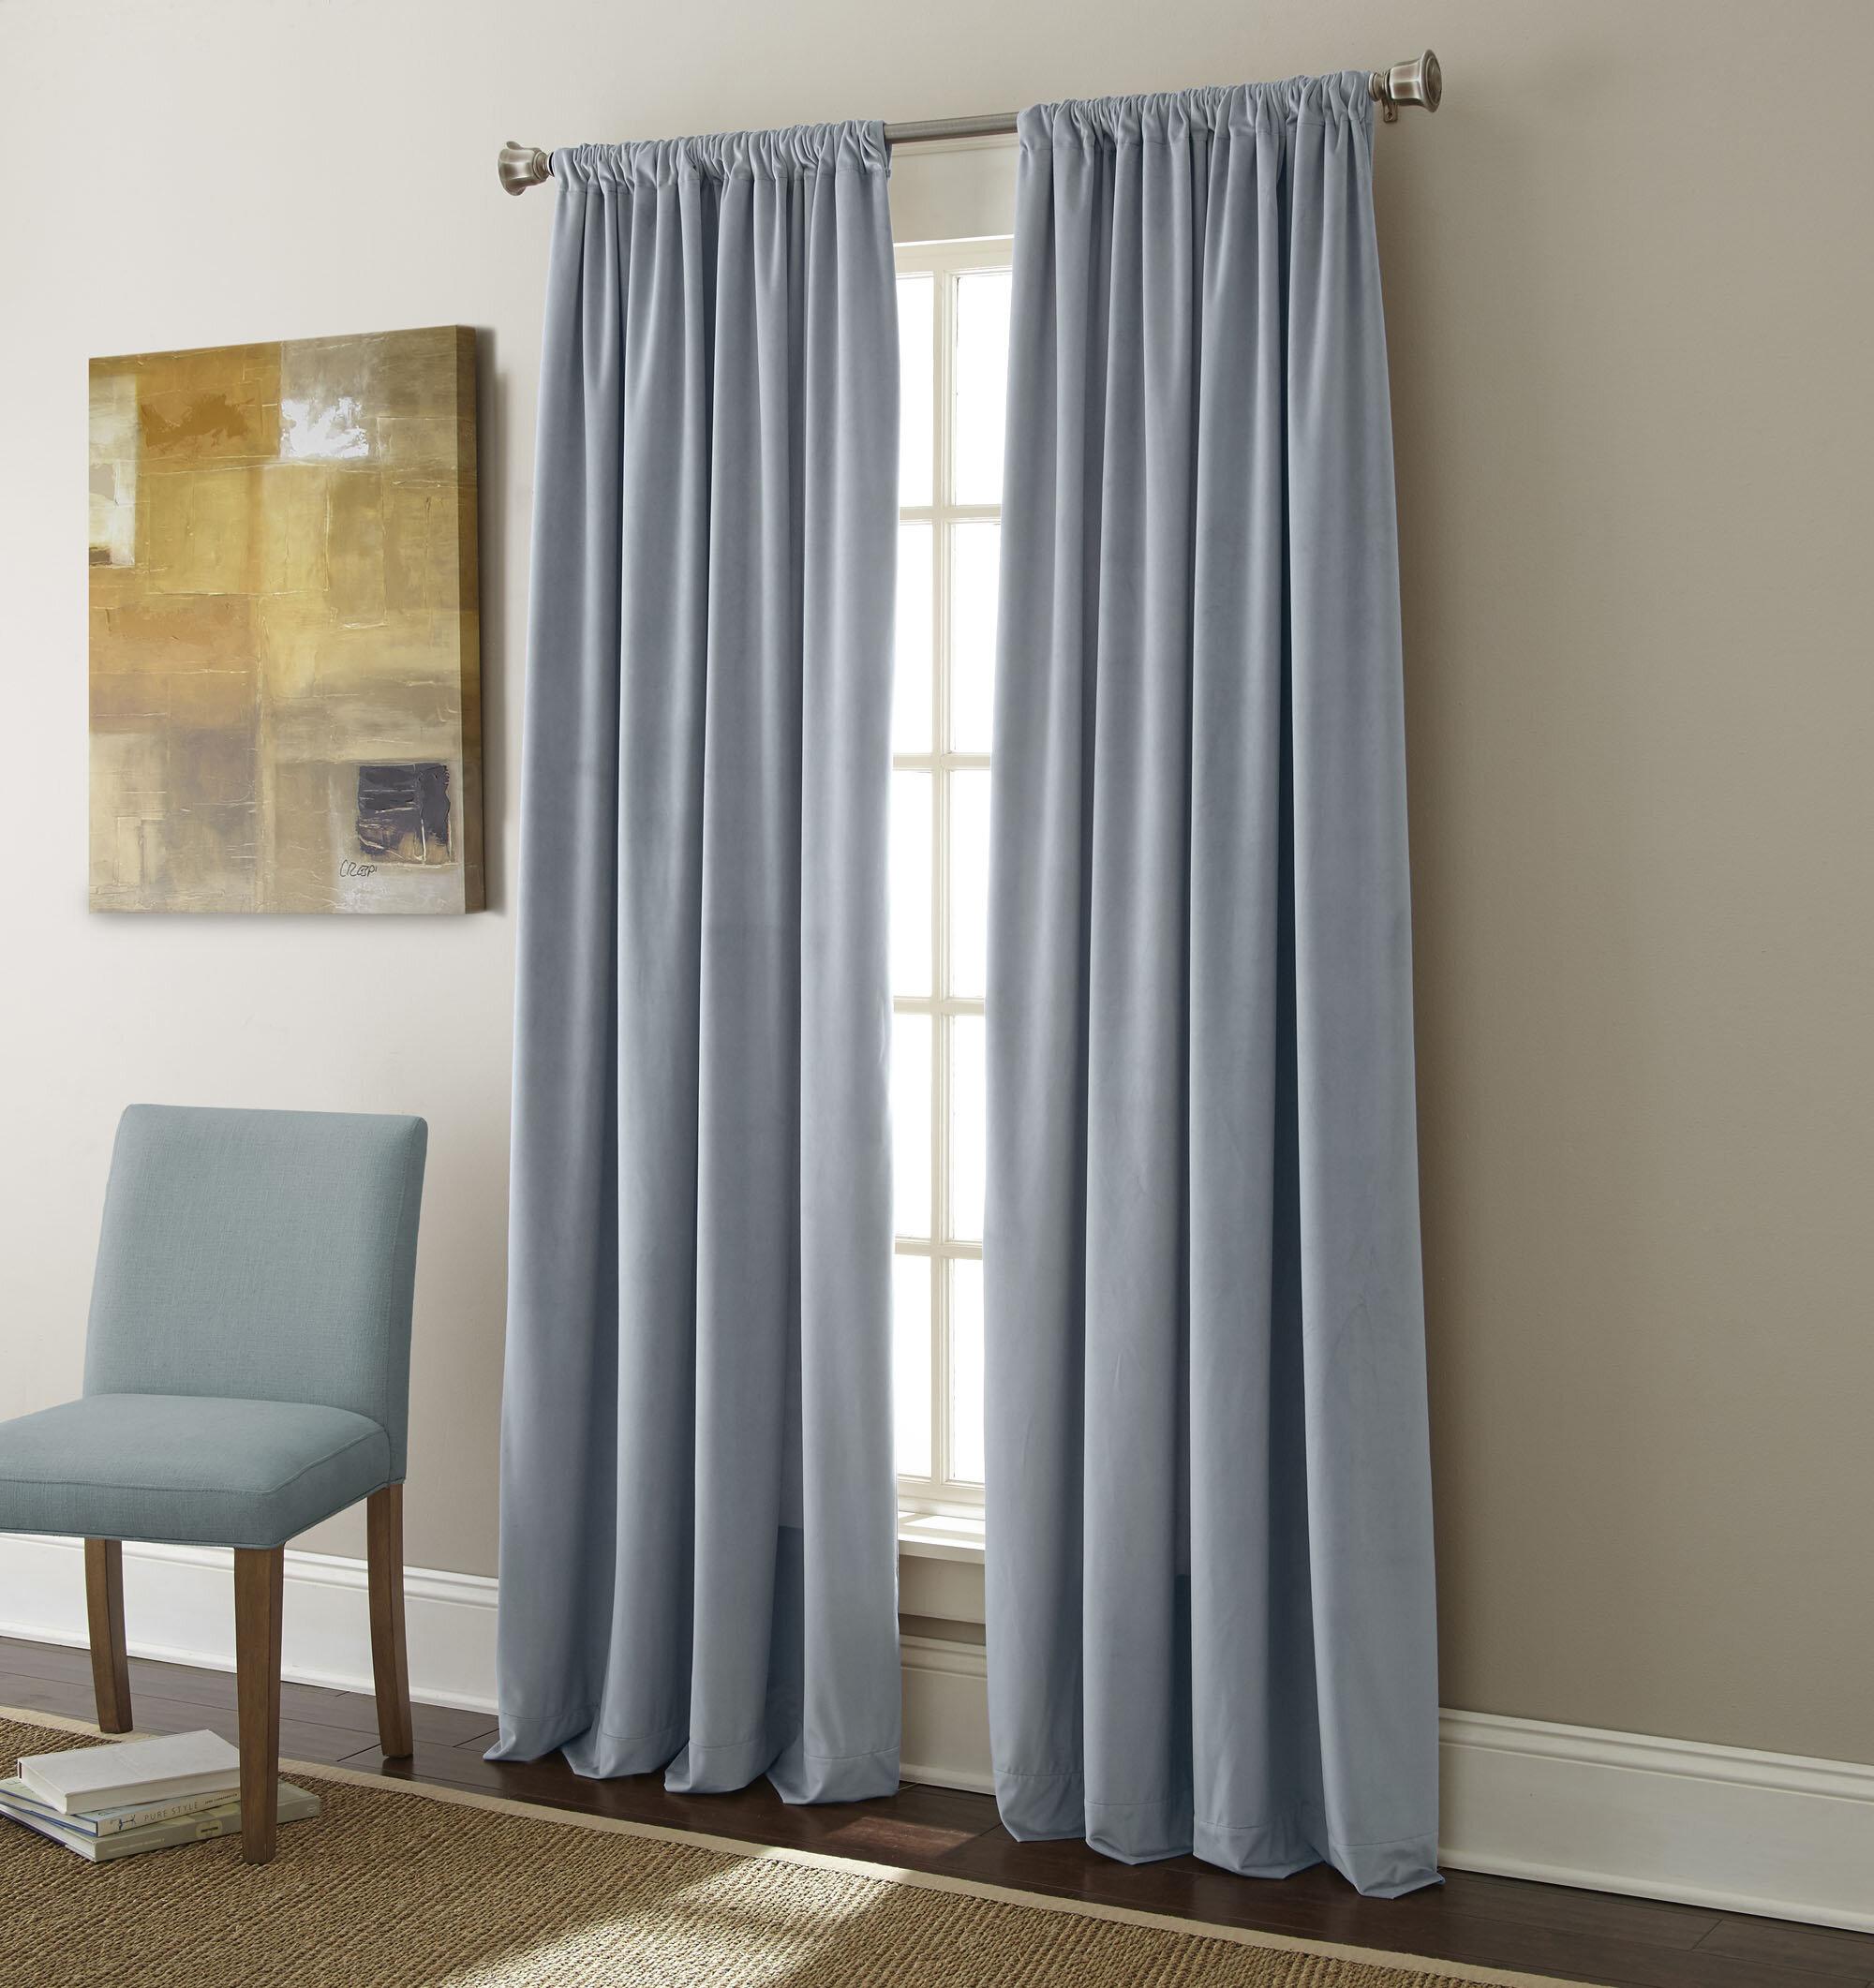 kitchen half curtain x com drapes signature amazon panels burgundy blackout vpch price velvet home dp